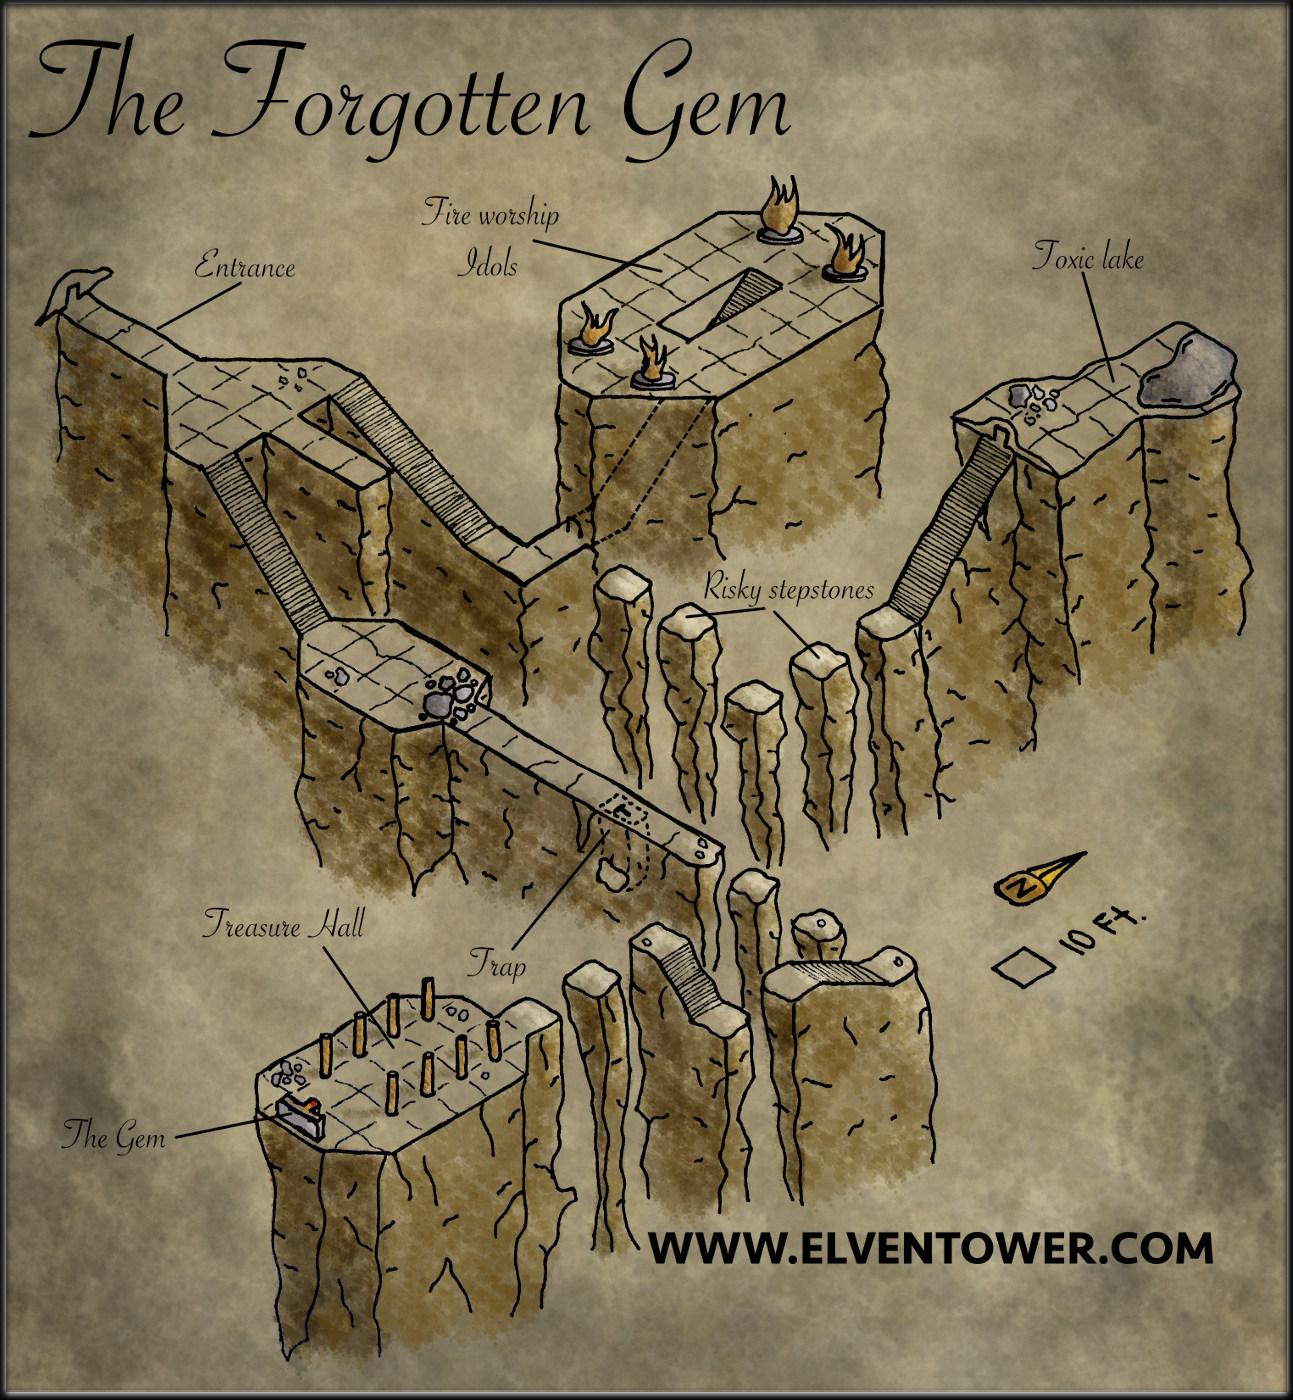 30-the-forgotten-geml